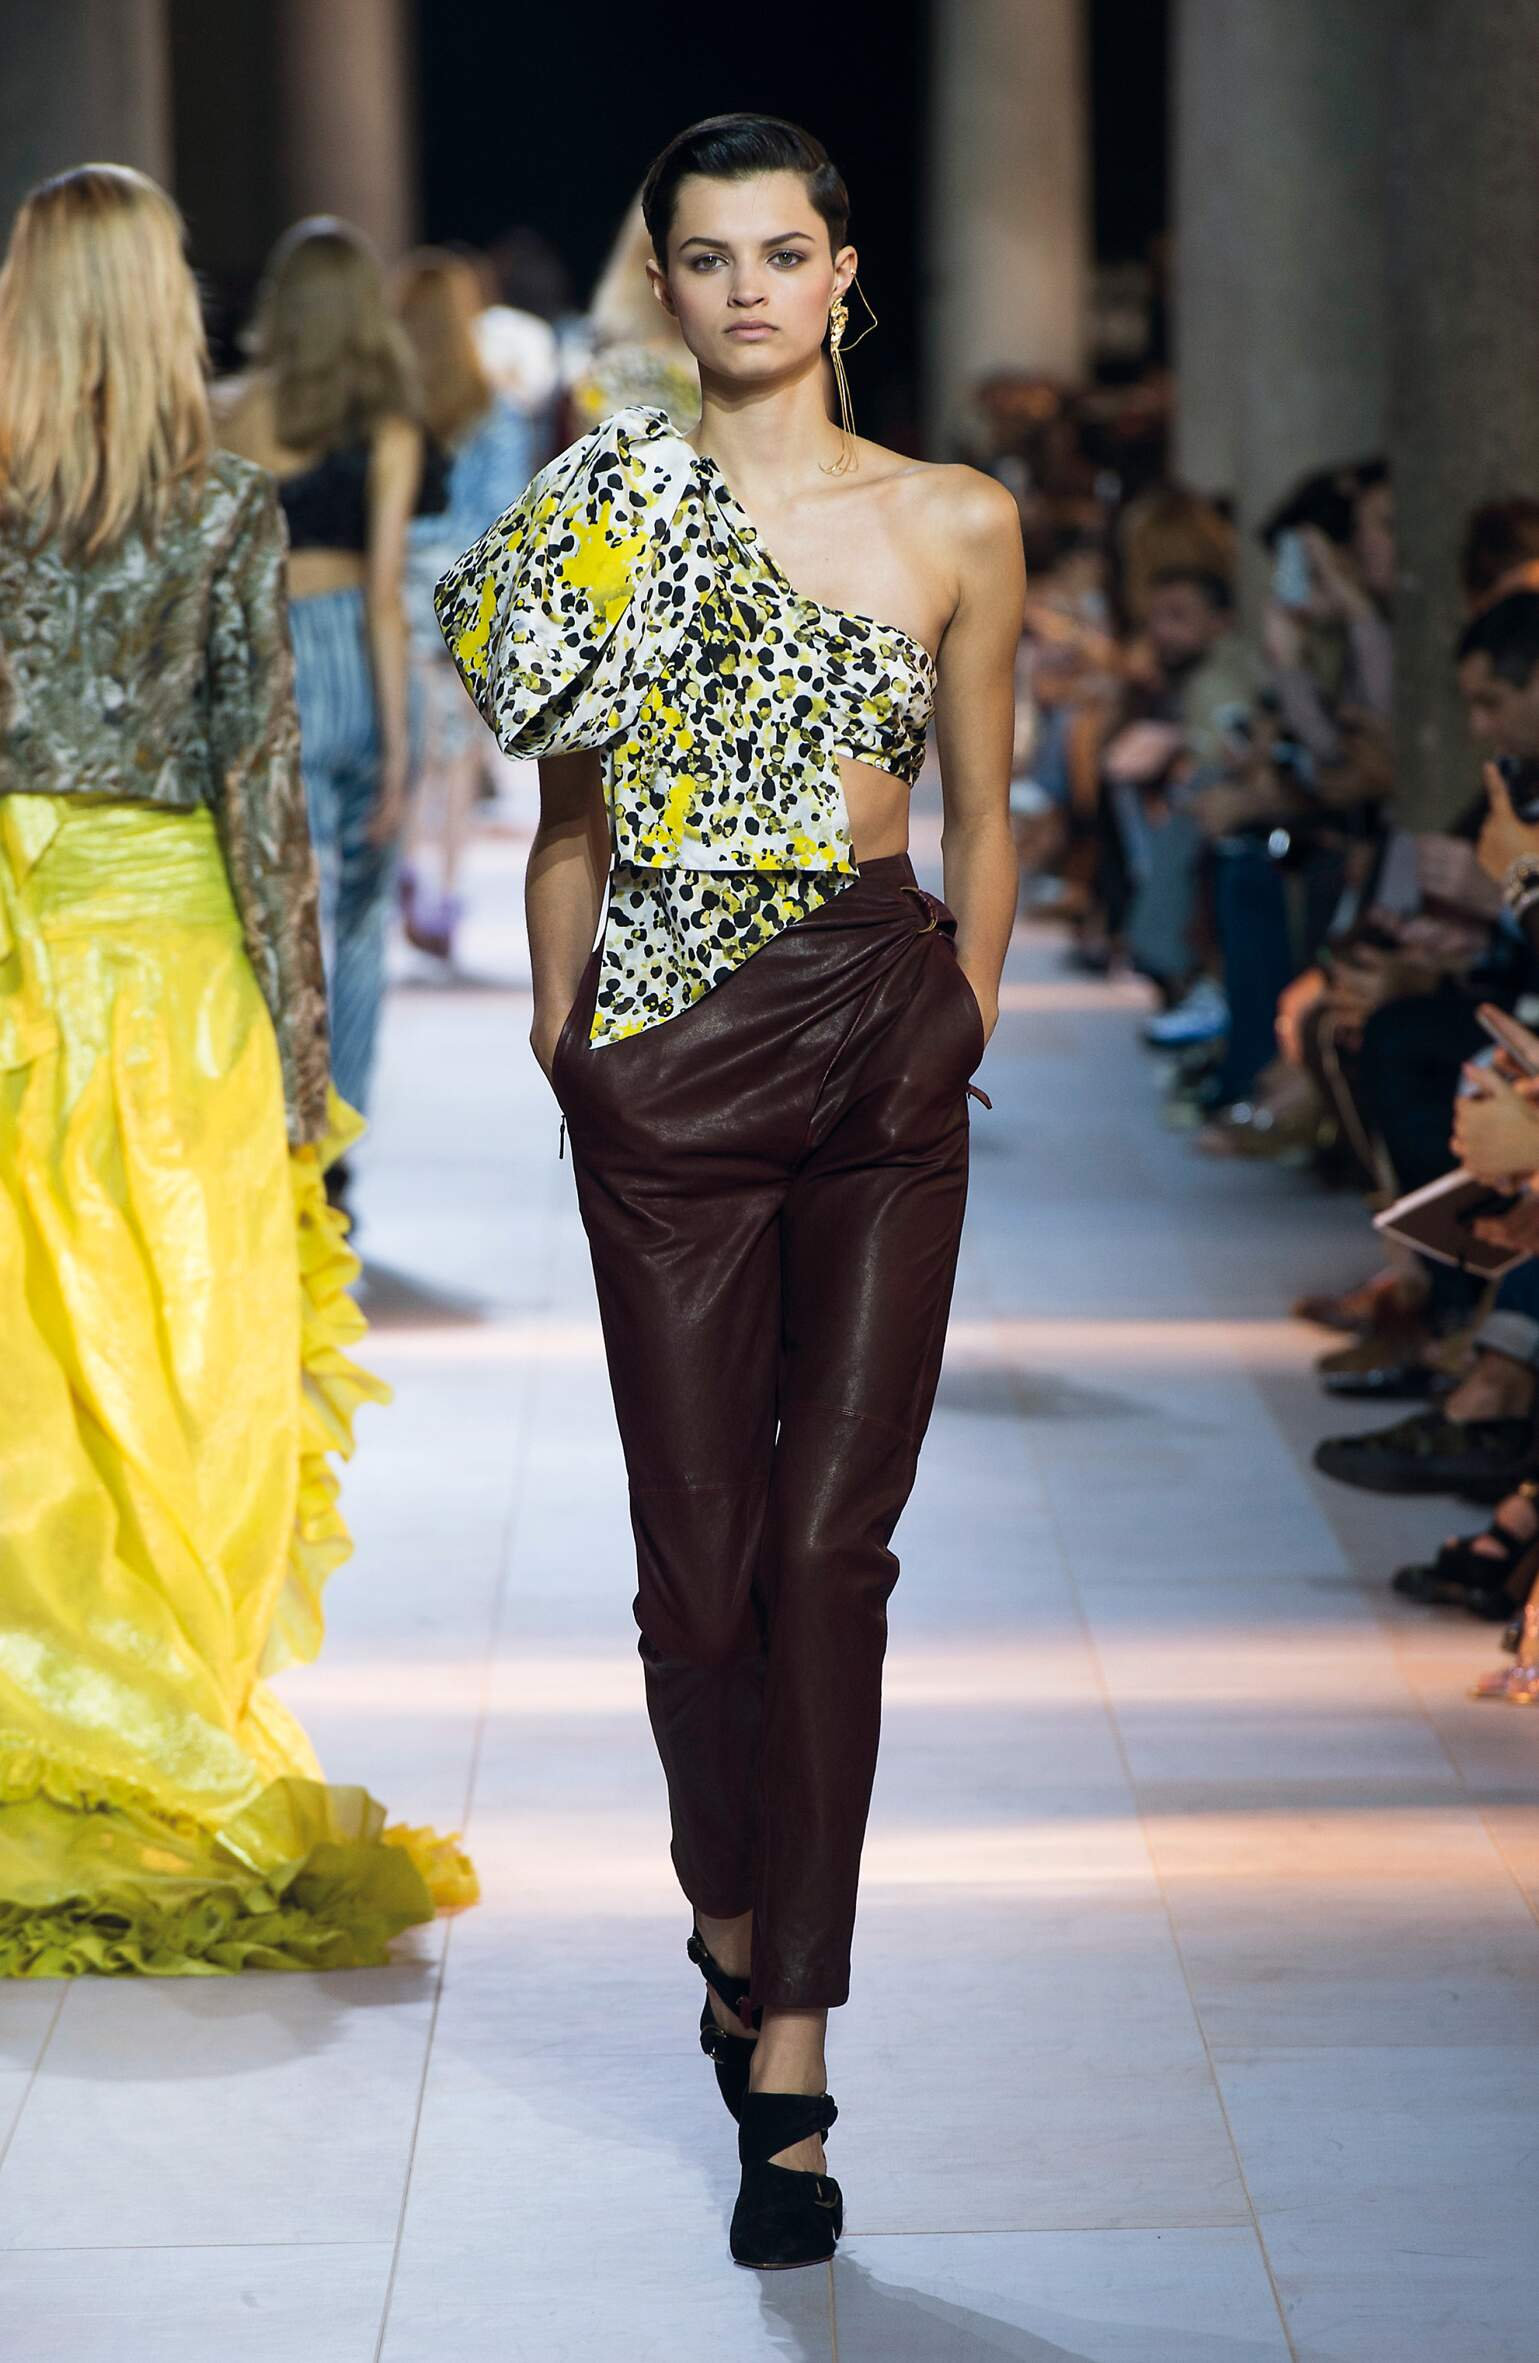 Fashion Woman Model Roberto Cavalli Catwalk